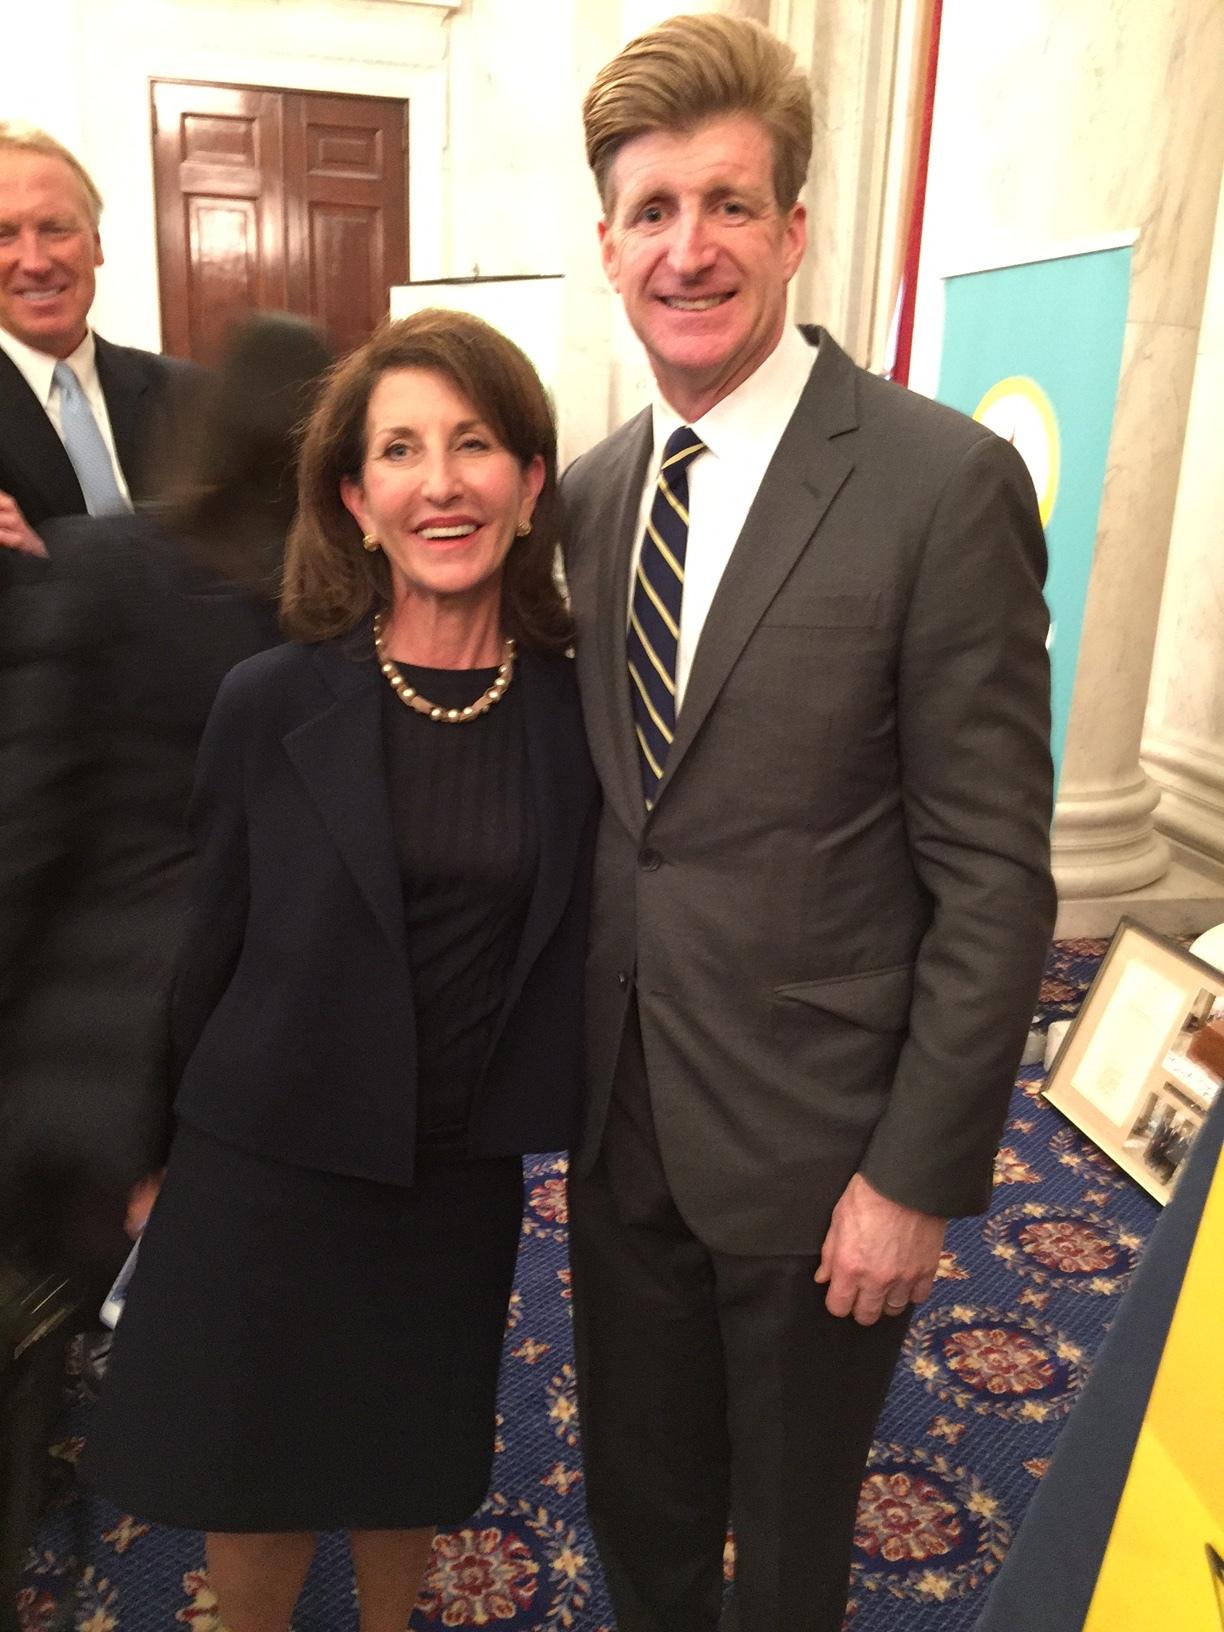 Anne with Patrick Kennedy.JPG